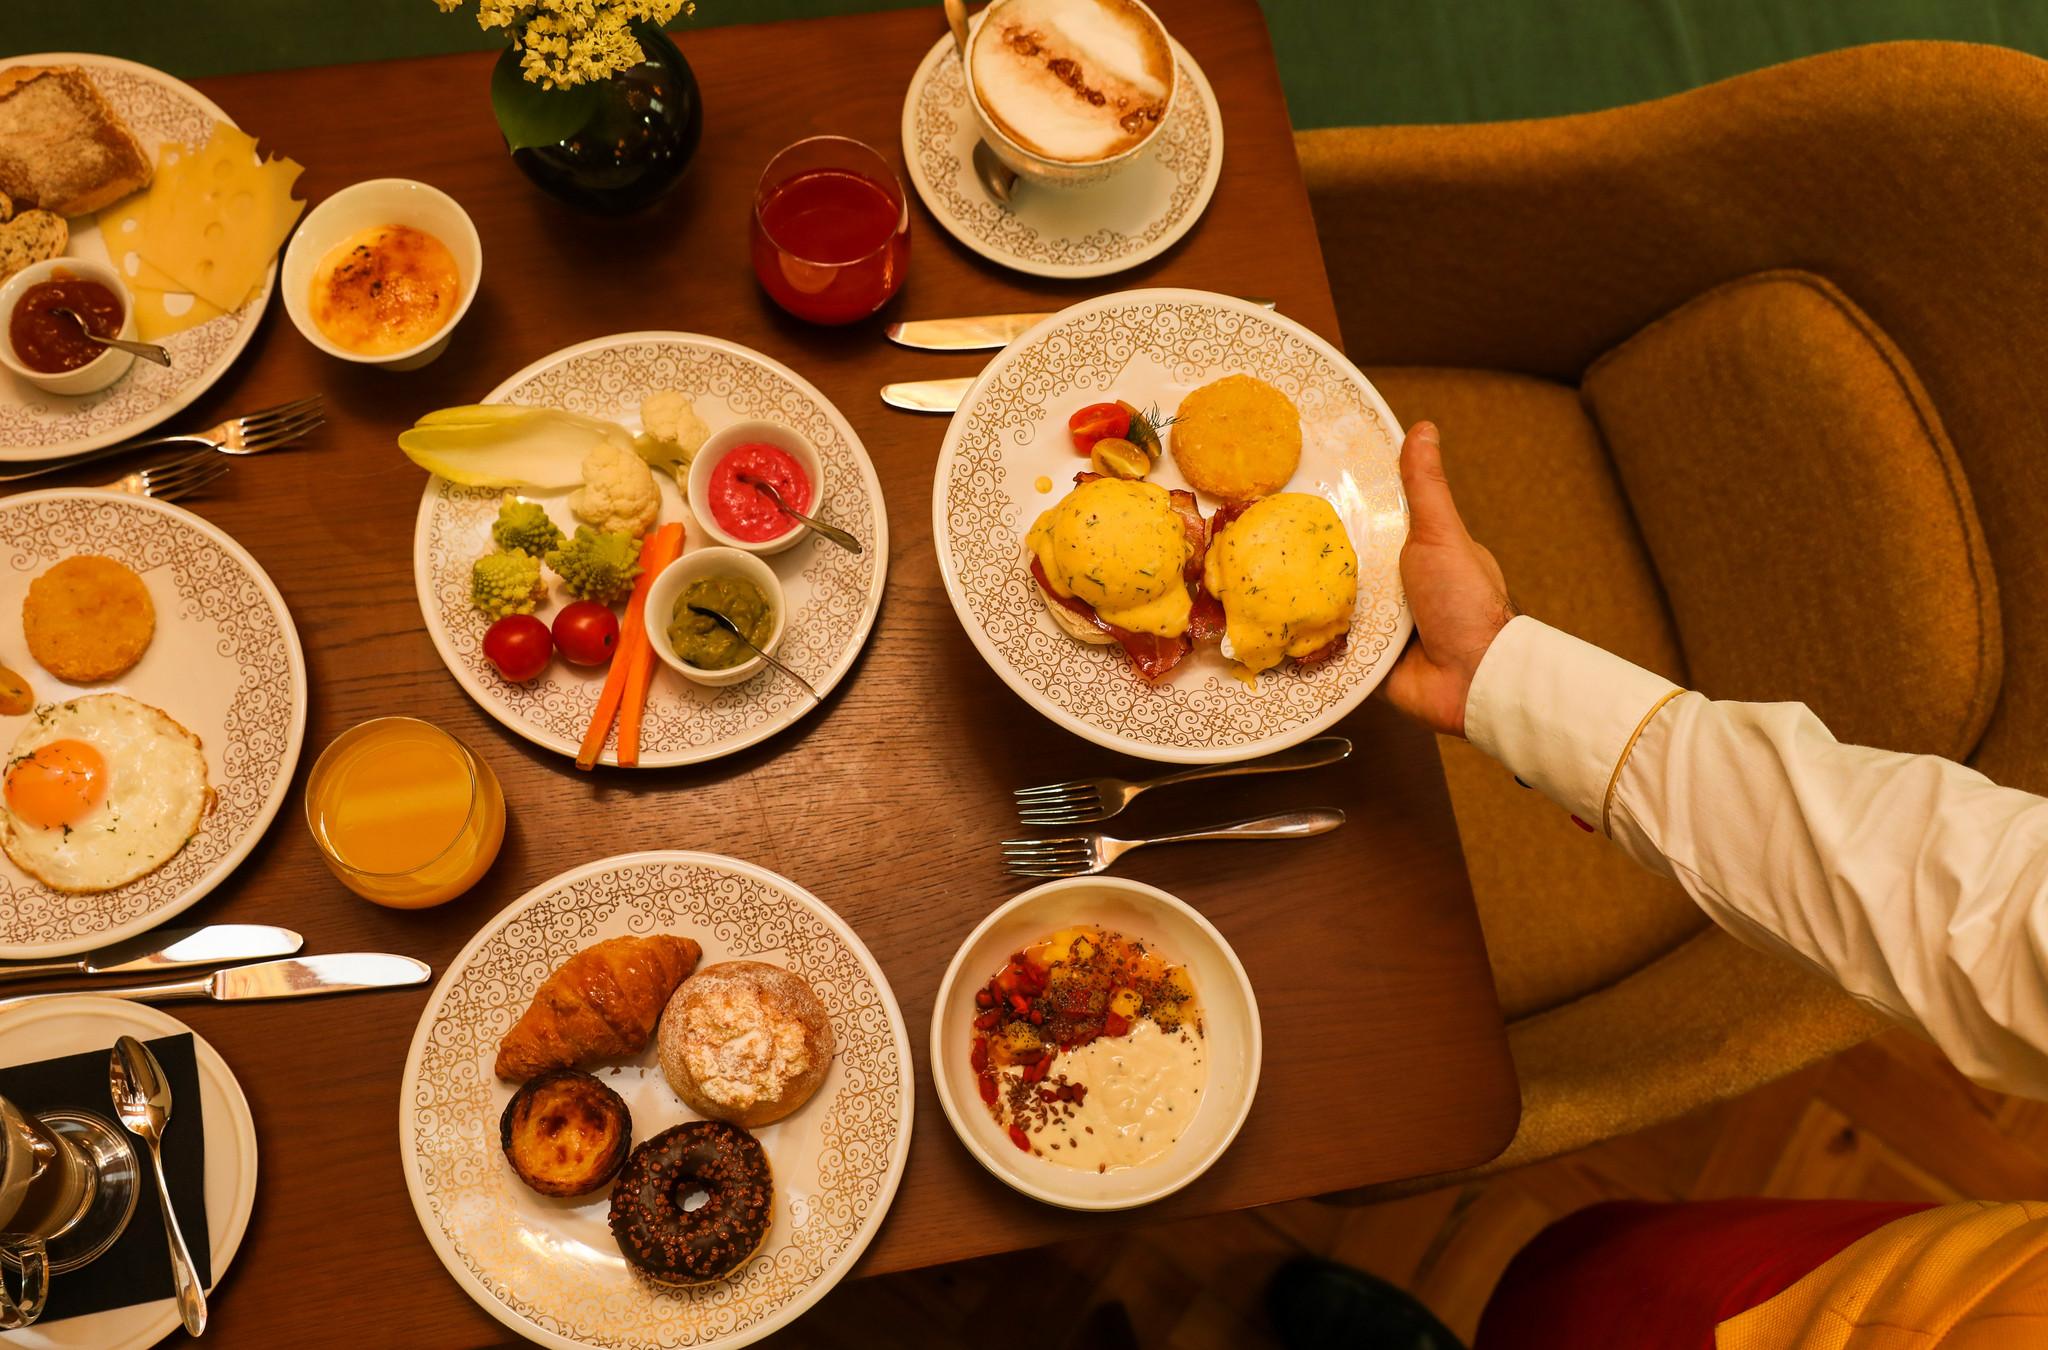 LM-Peq almoço hotel Infante Sagres-4.jpg